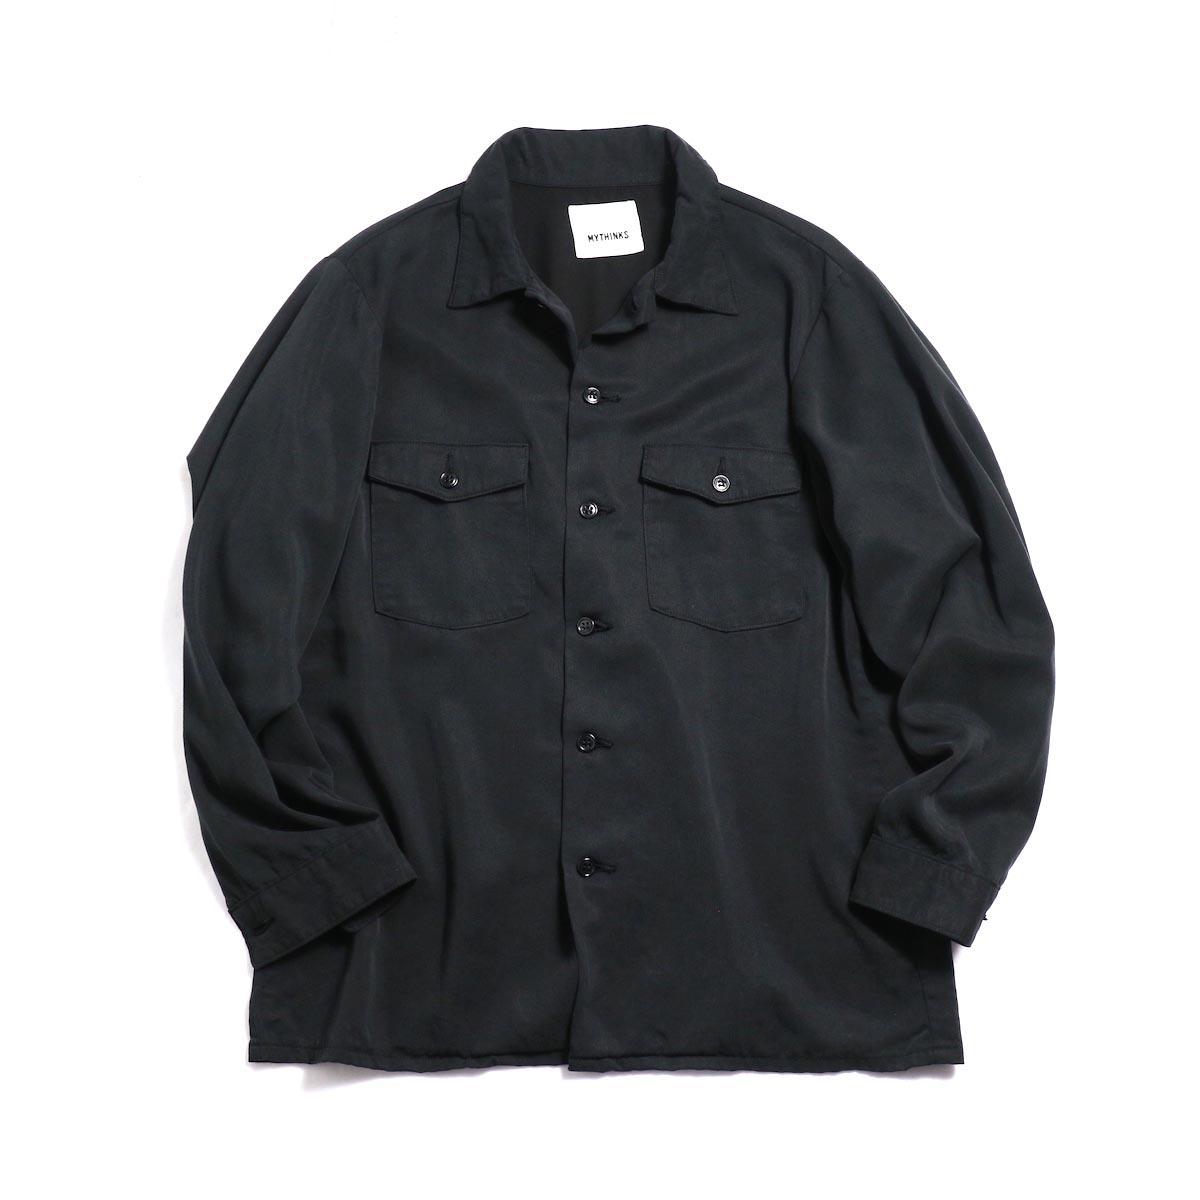 MYTHINKS (Men's) / MY Tencel Army Shirt -Black